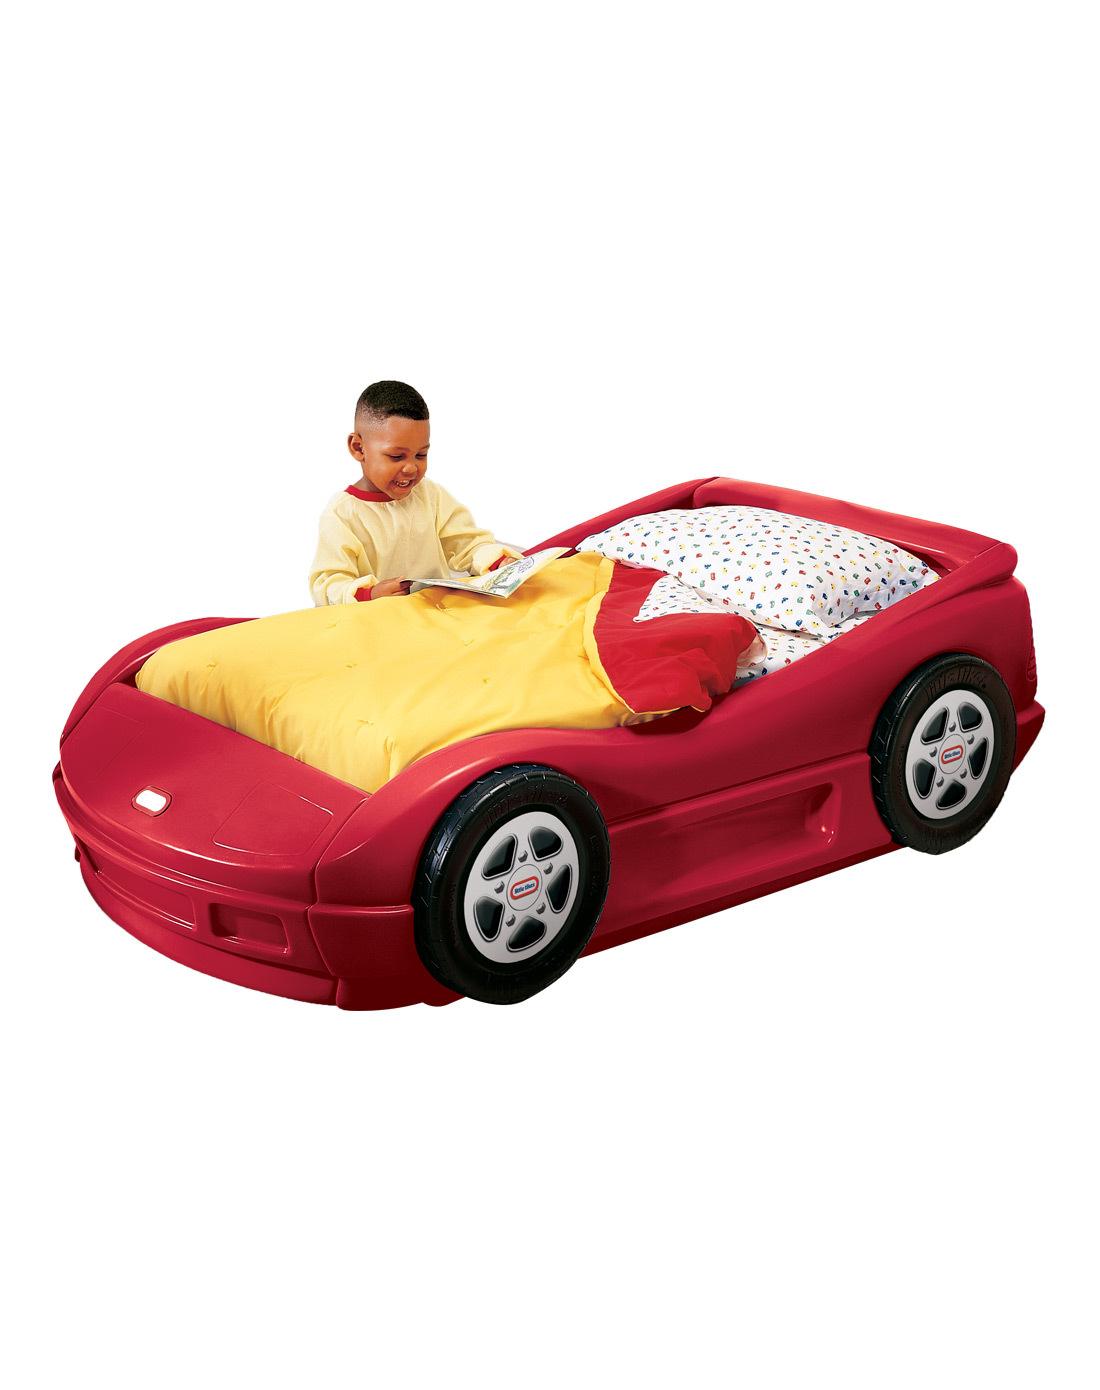 Littletikes小泰克 儿童跑车造型床宝宝卡通床婴儿床全国包邮